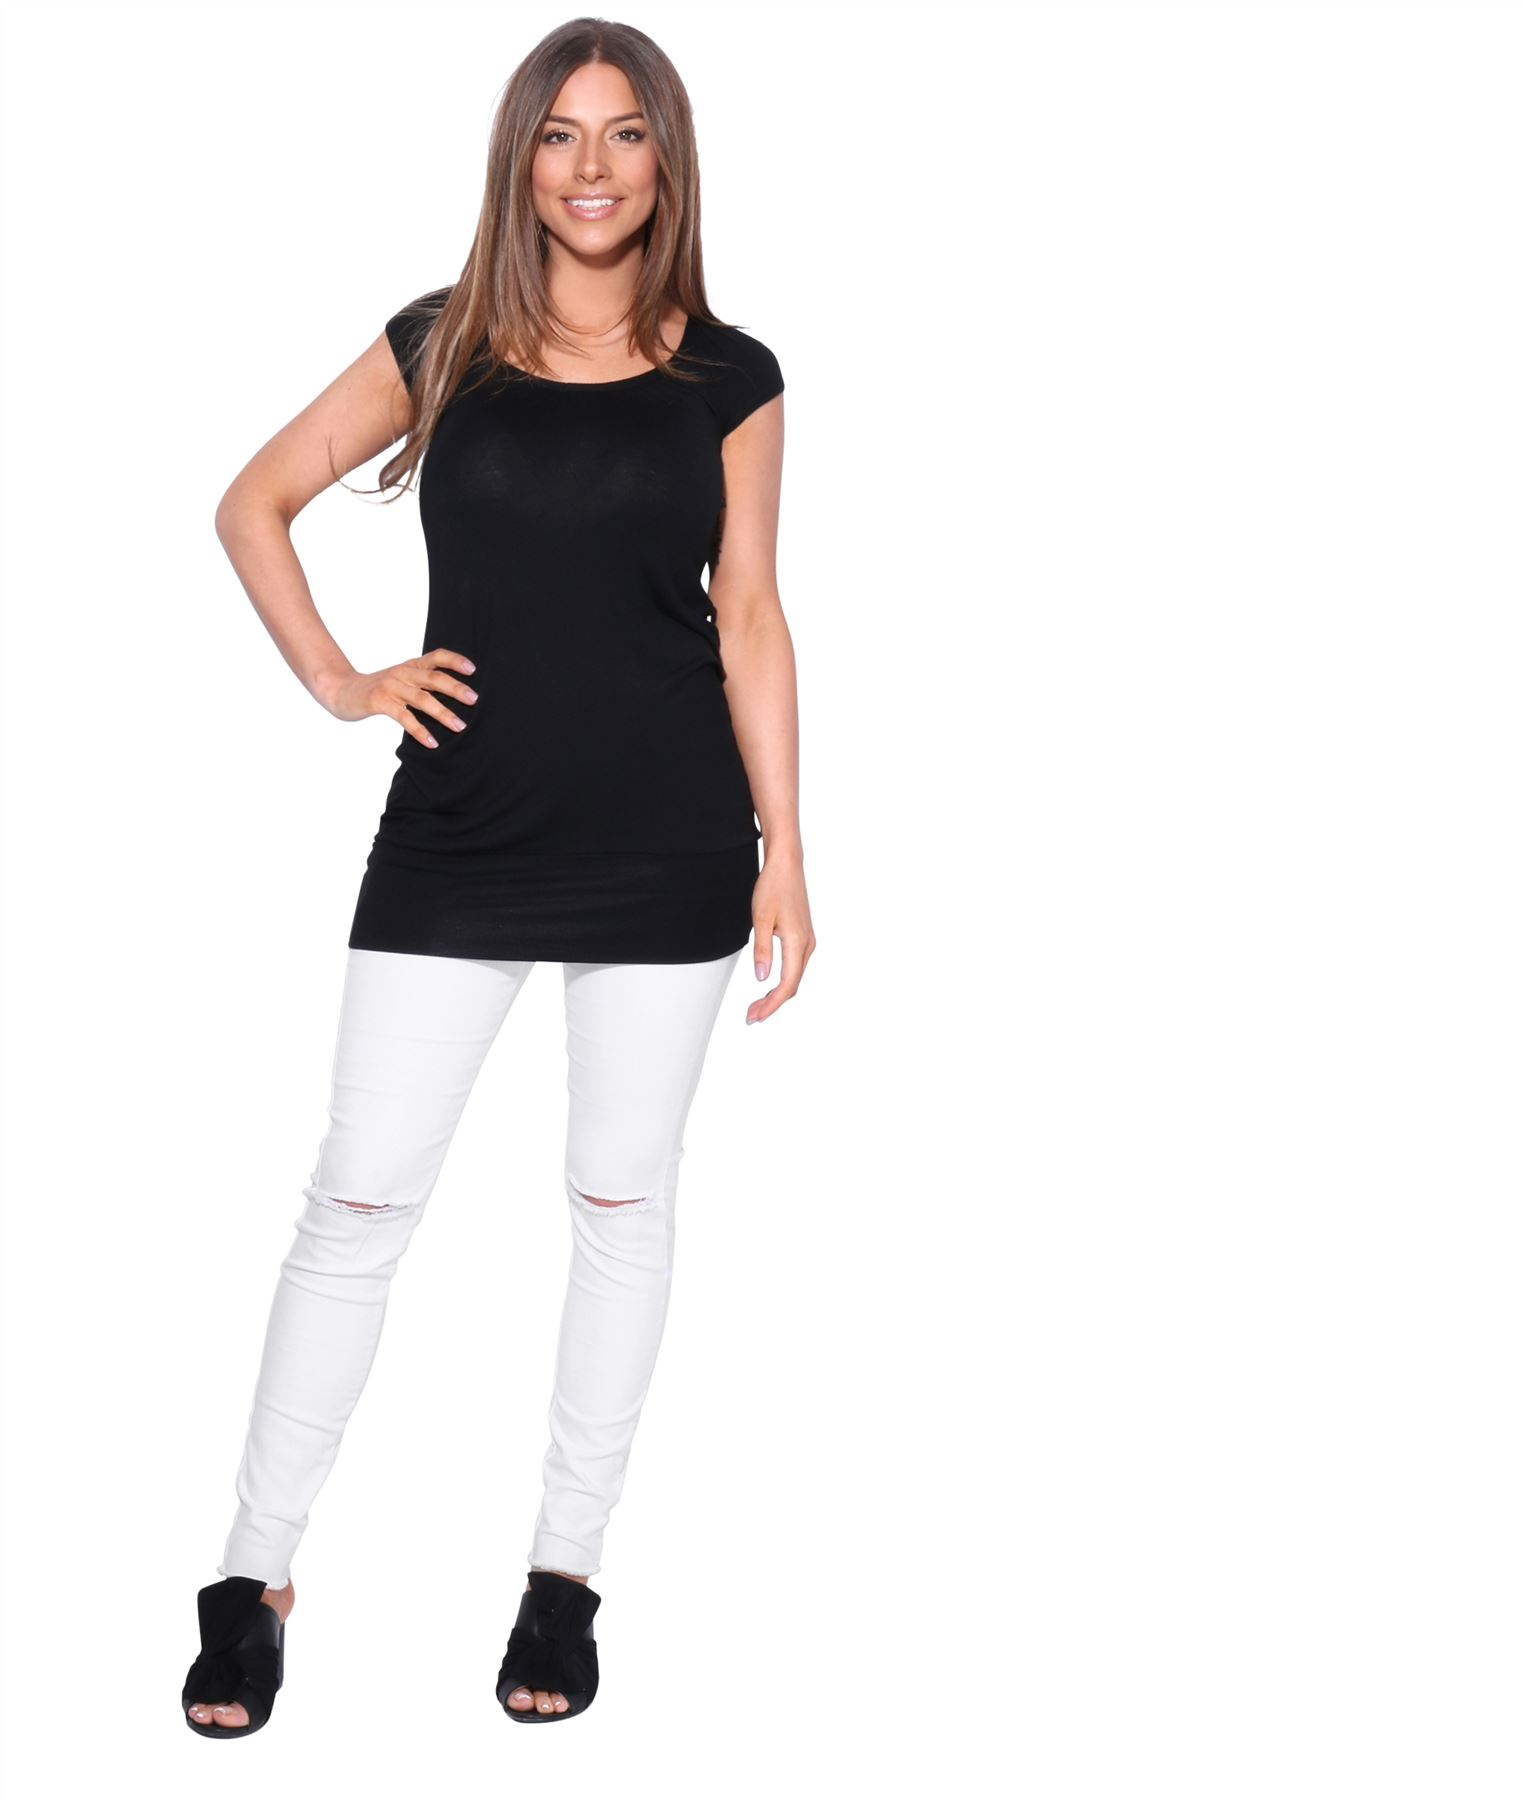 Womens-Ladies-Scoop-Neck-Blouse-V-T-Shirt-Long-Short-Sleeve-Plain-Loose-Top thumbnail 10